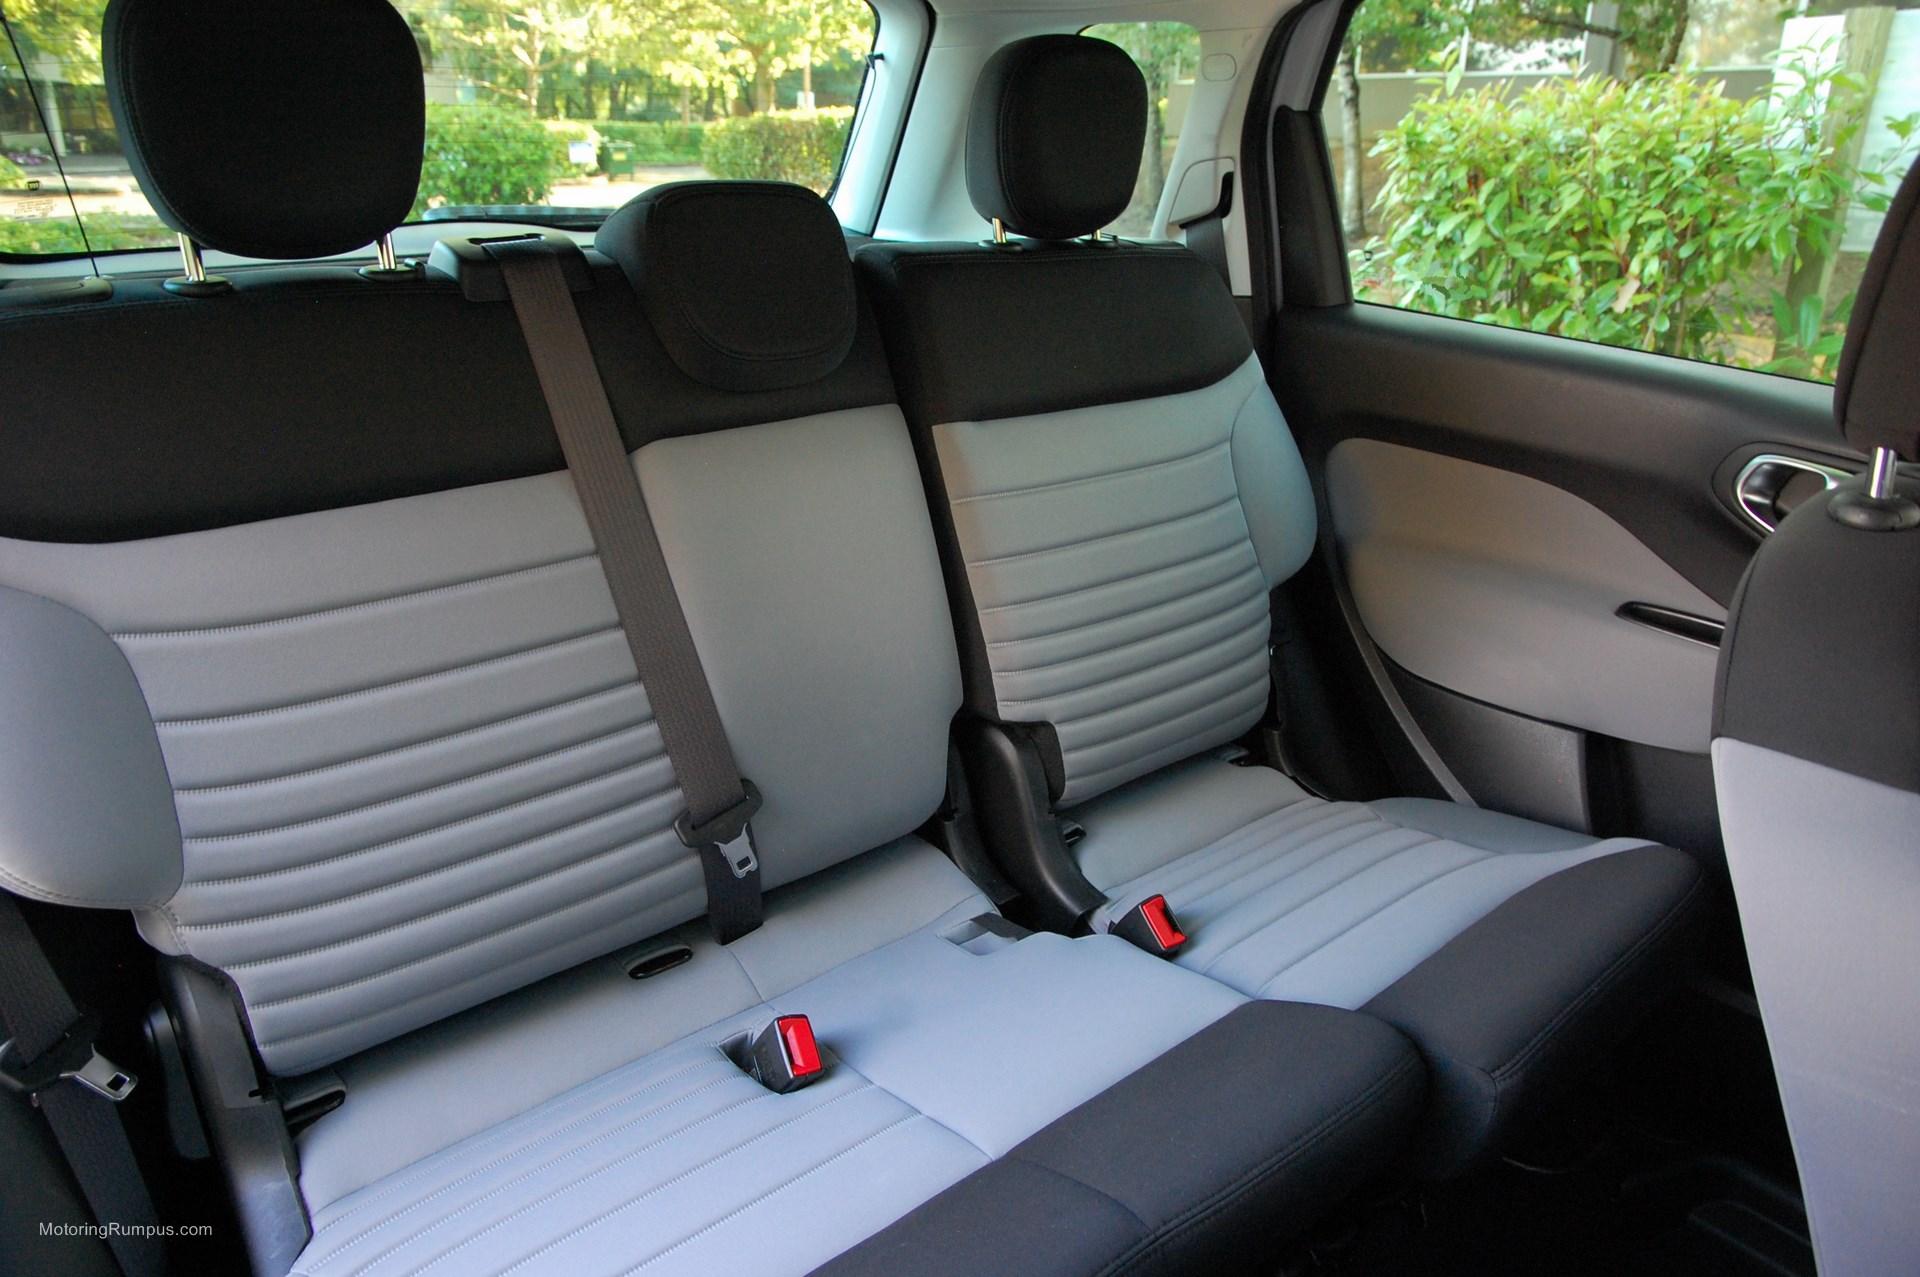 2014 Fiat 500l Review Motoring Rumpus